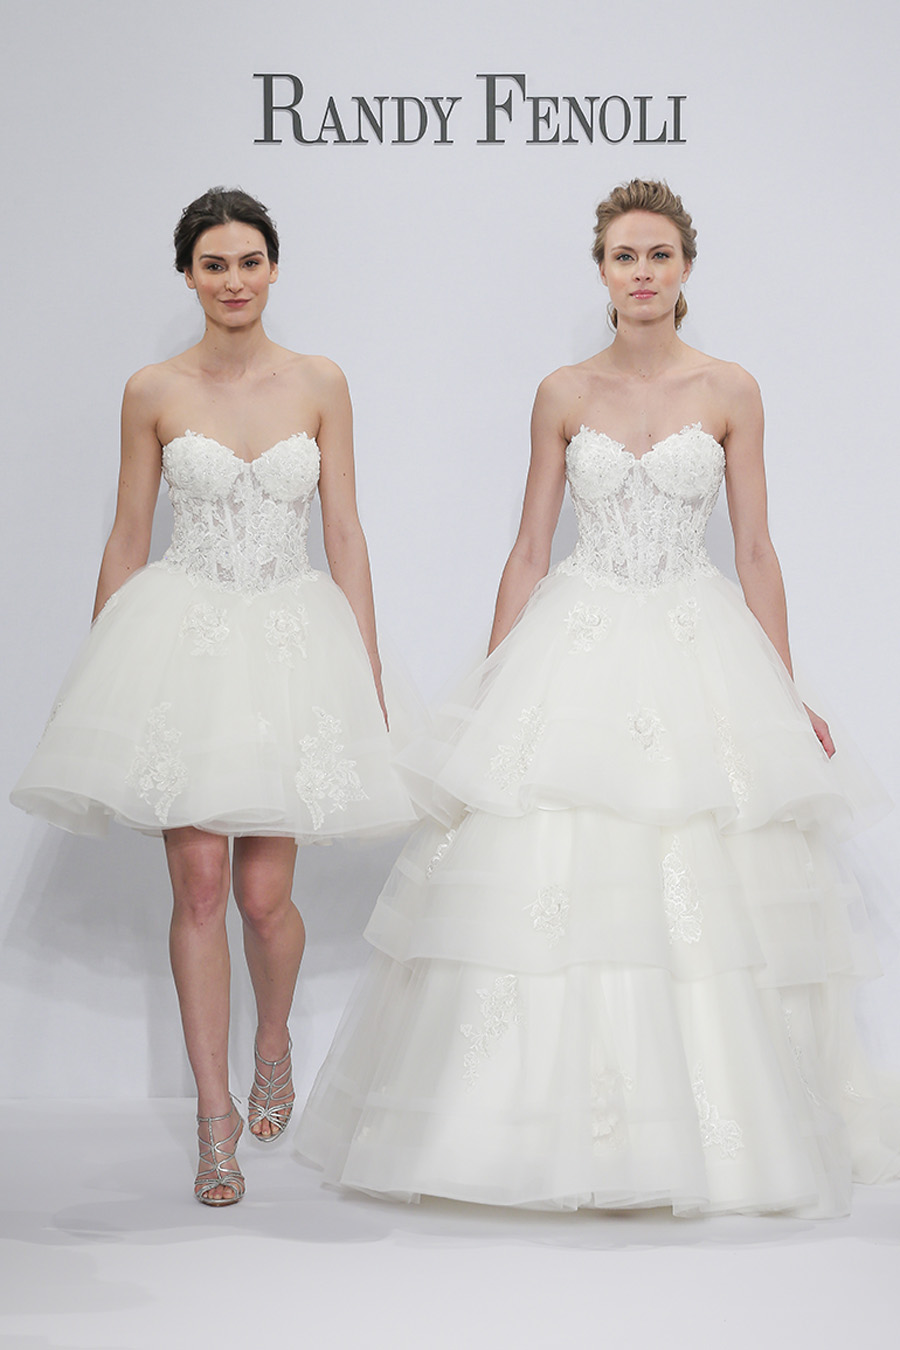 Randy Fenoli Bridal Collection gown 7